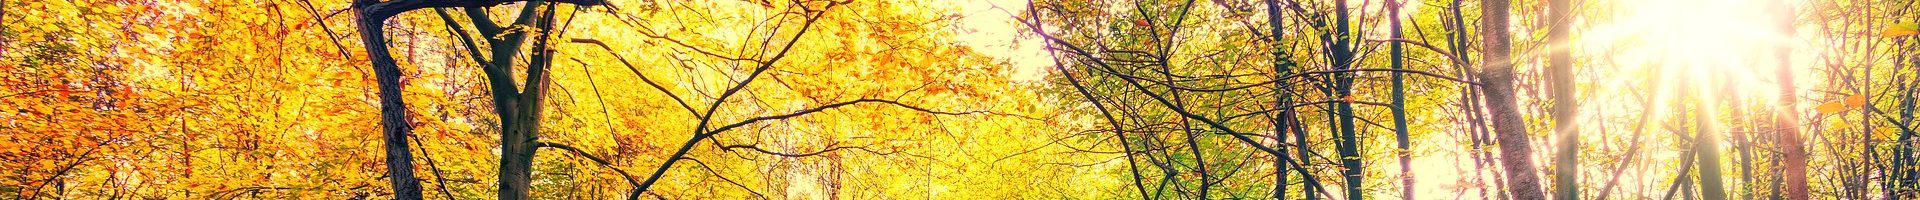 Herbstliches Hintergrundbild Praxis Dr. Cynthia Quiroga Murcia